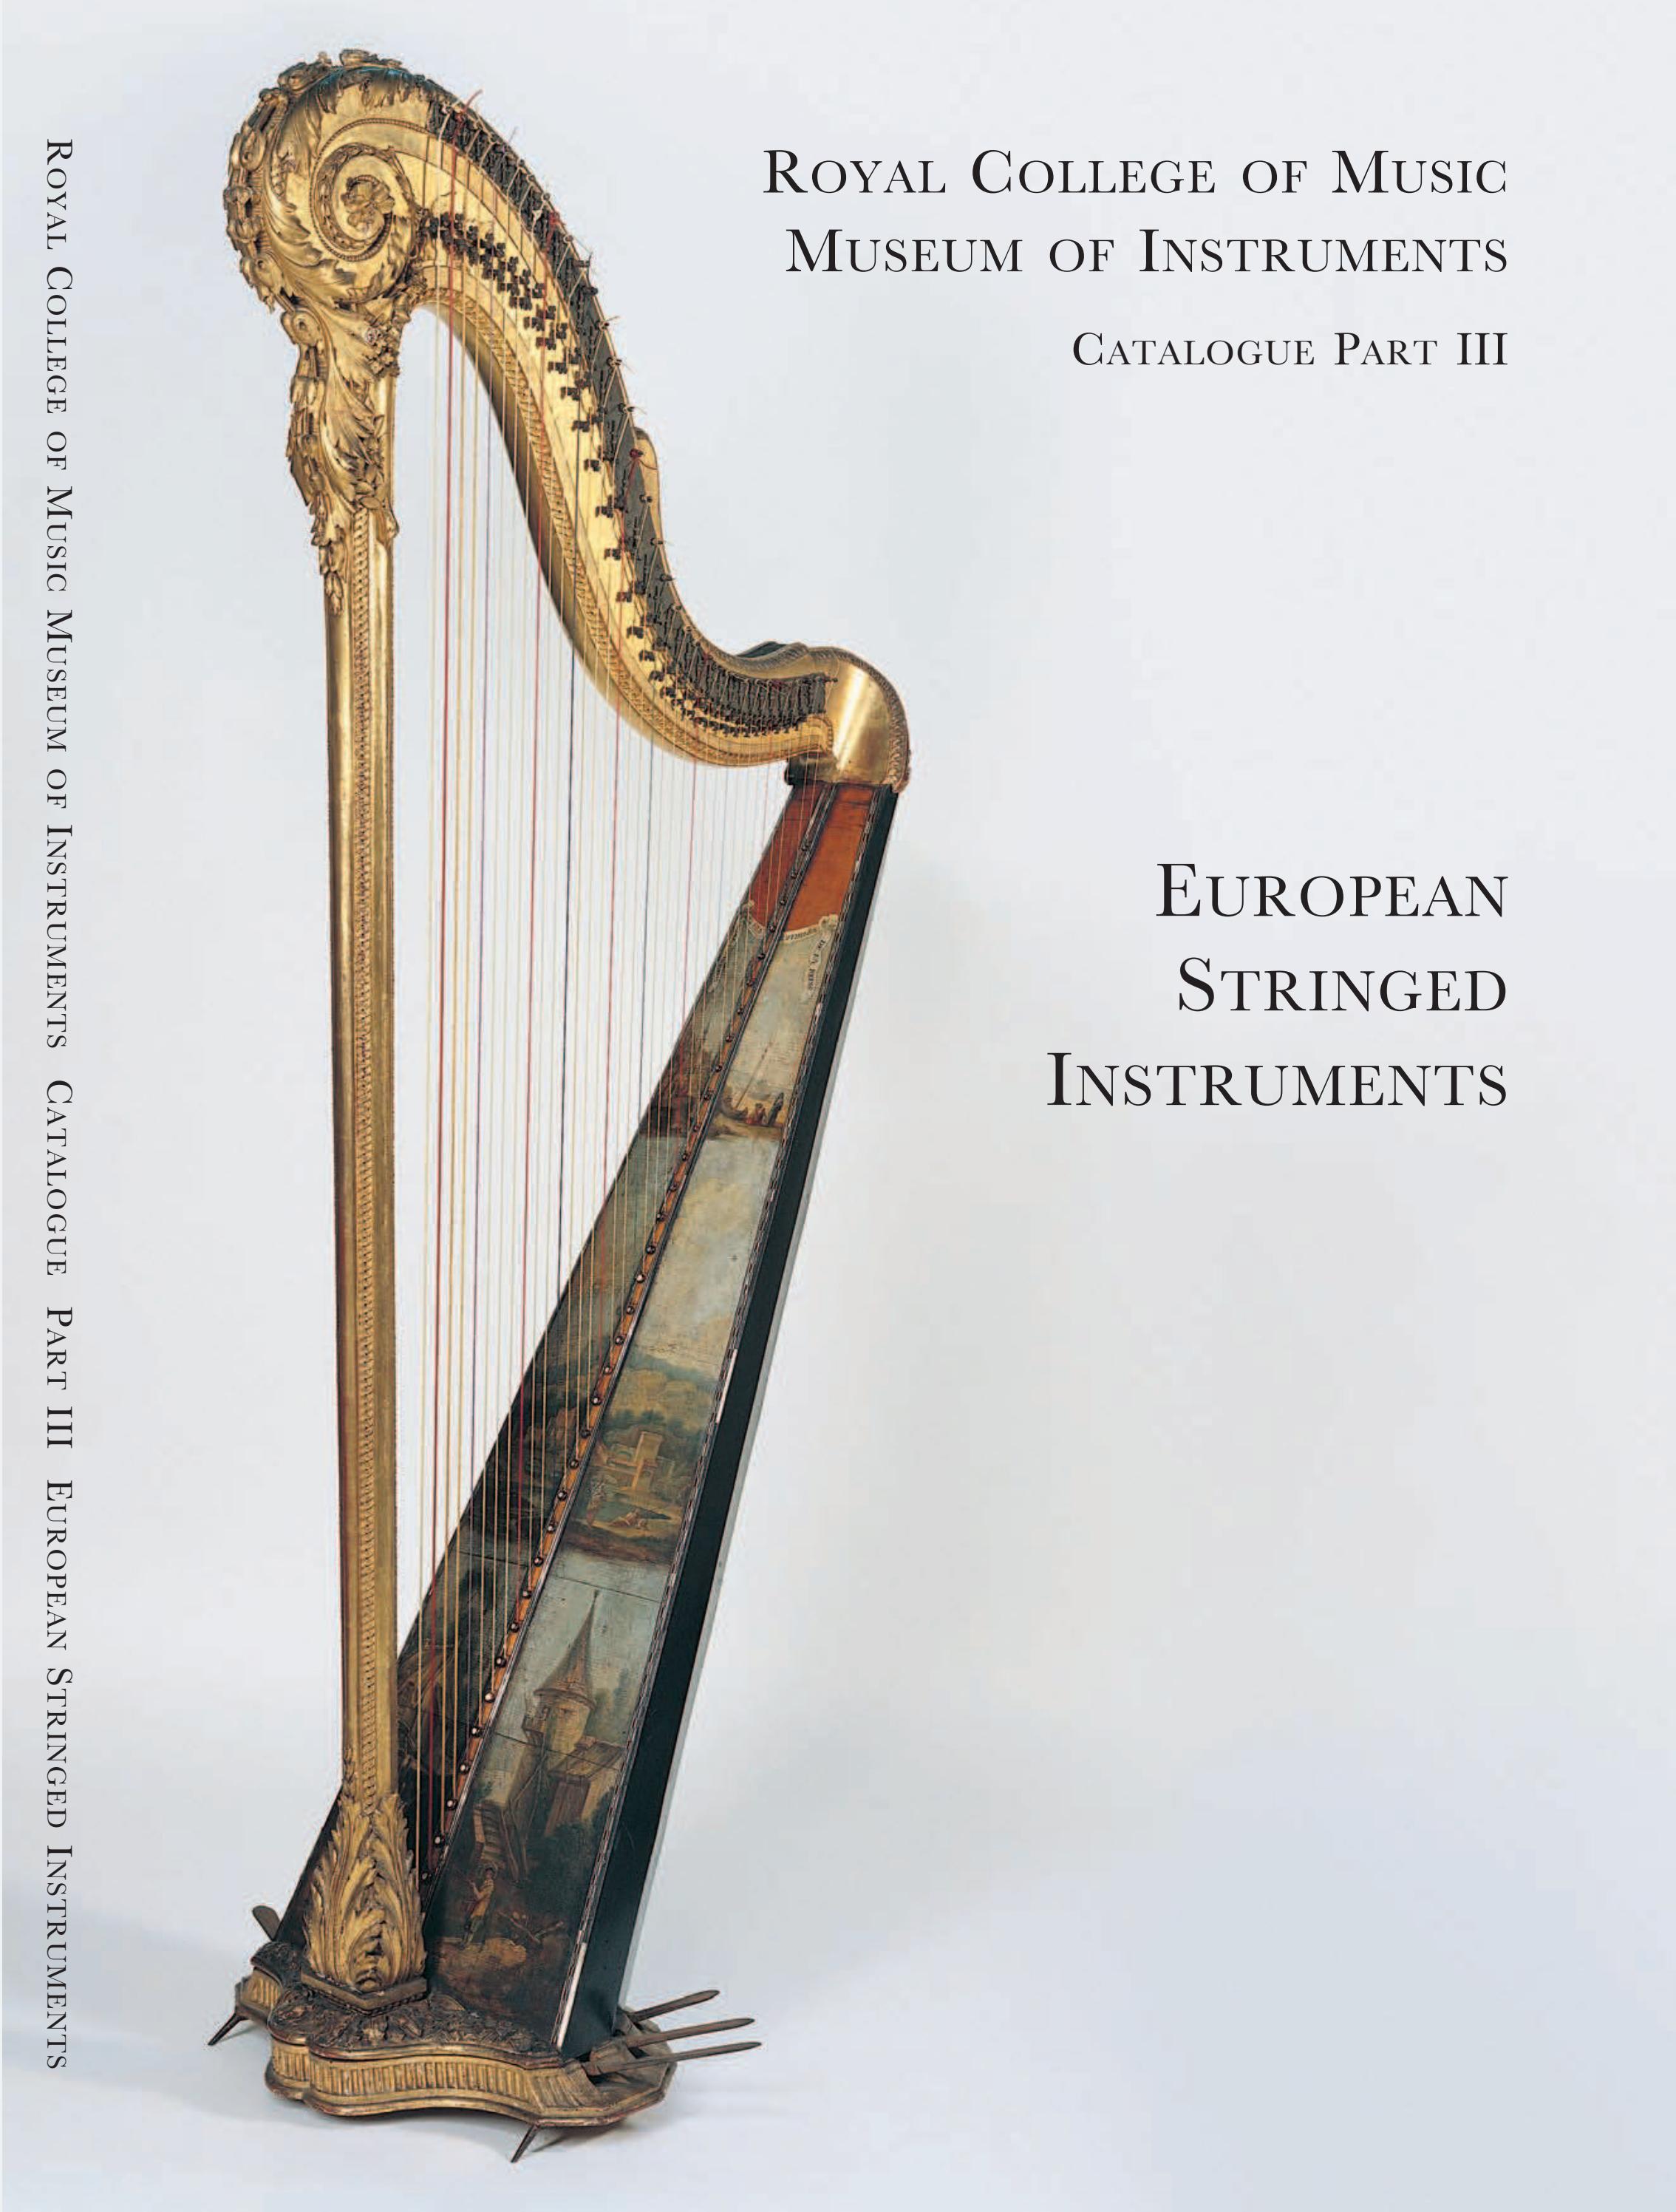 Rcm Museum Of Instruments Catalogue Part Iii European